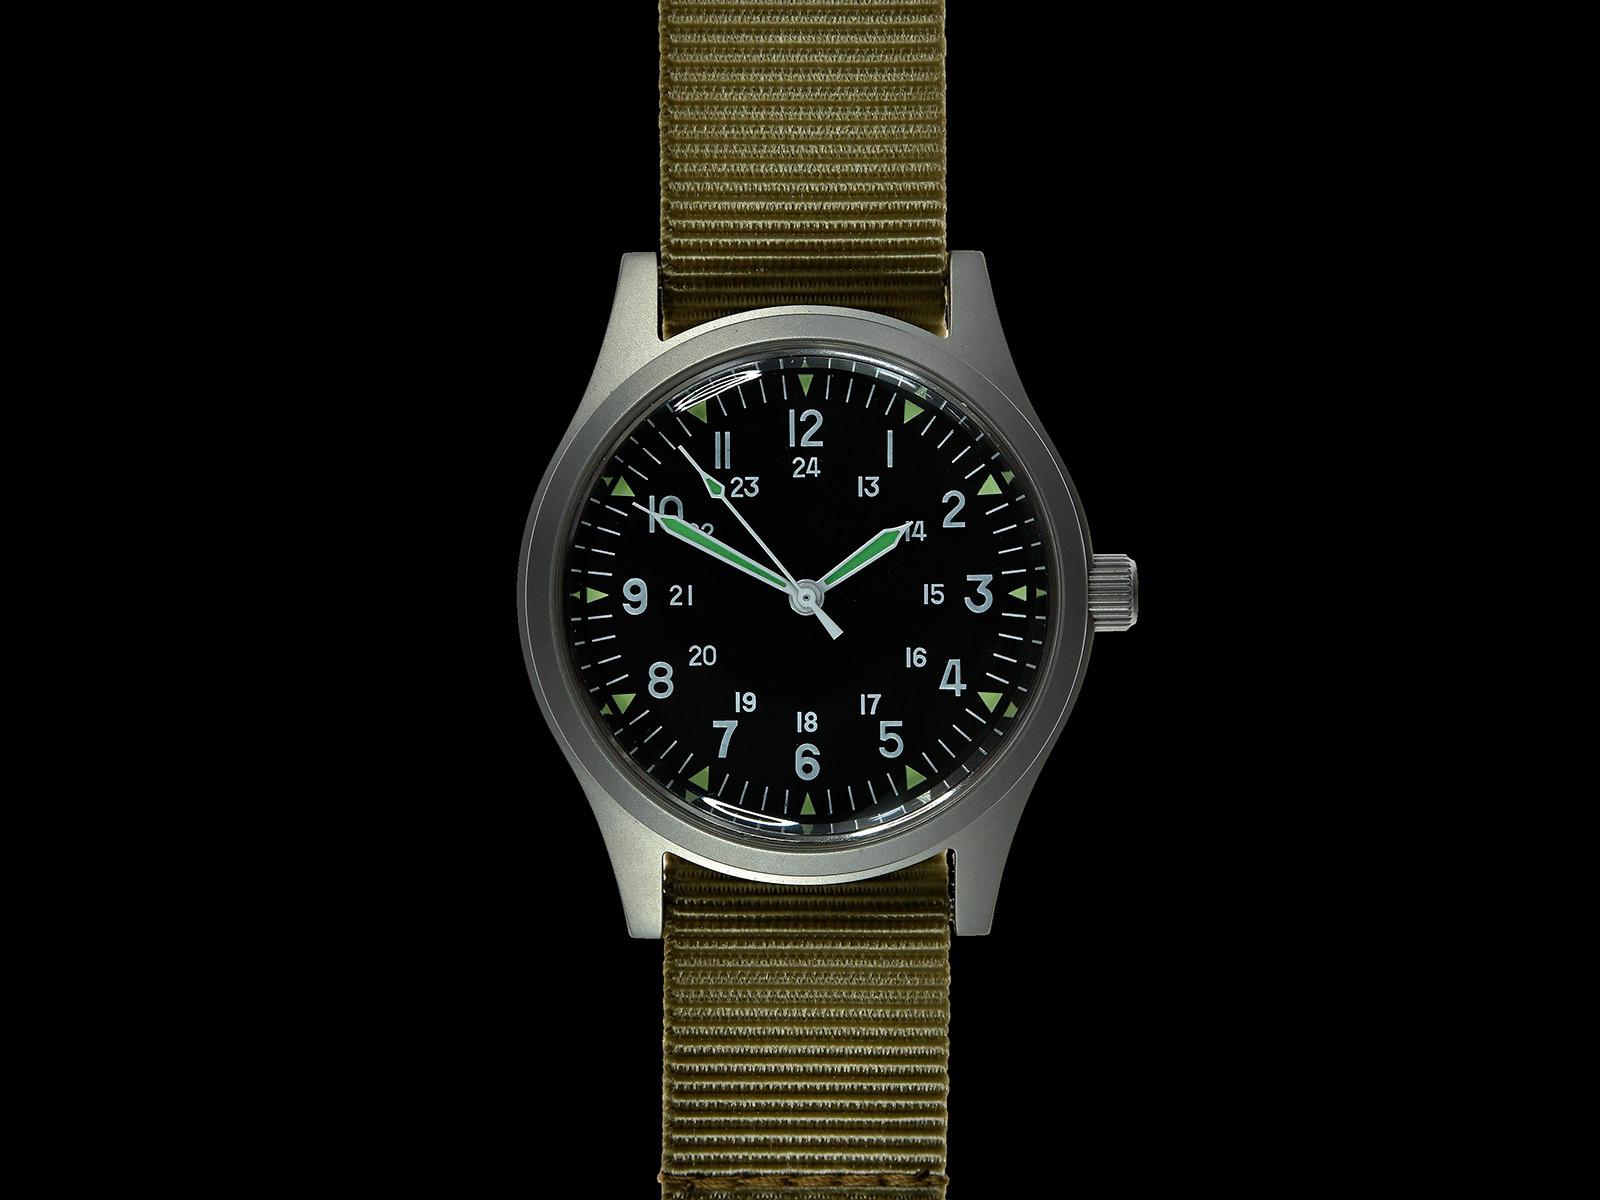 MWC GG-W-113 Military Watch